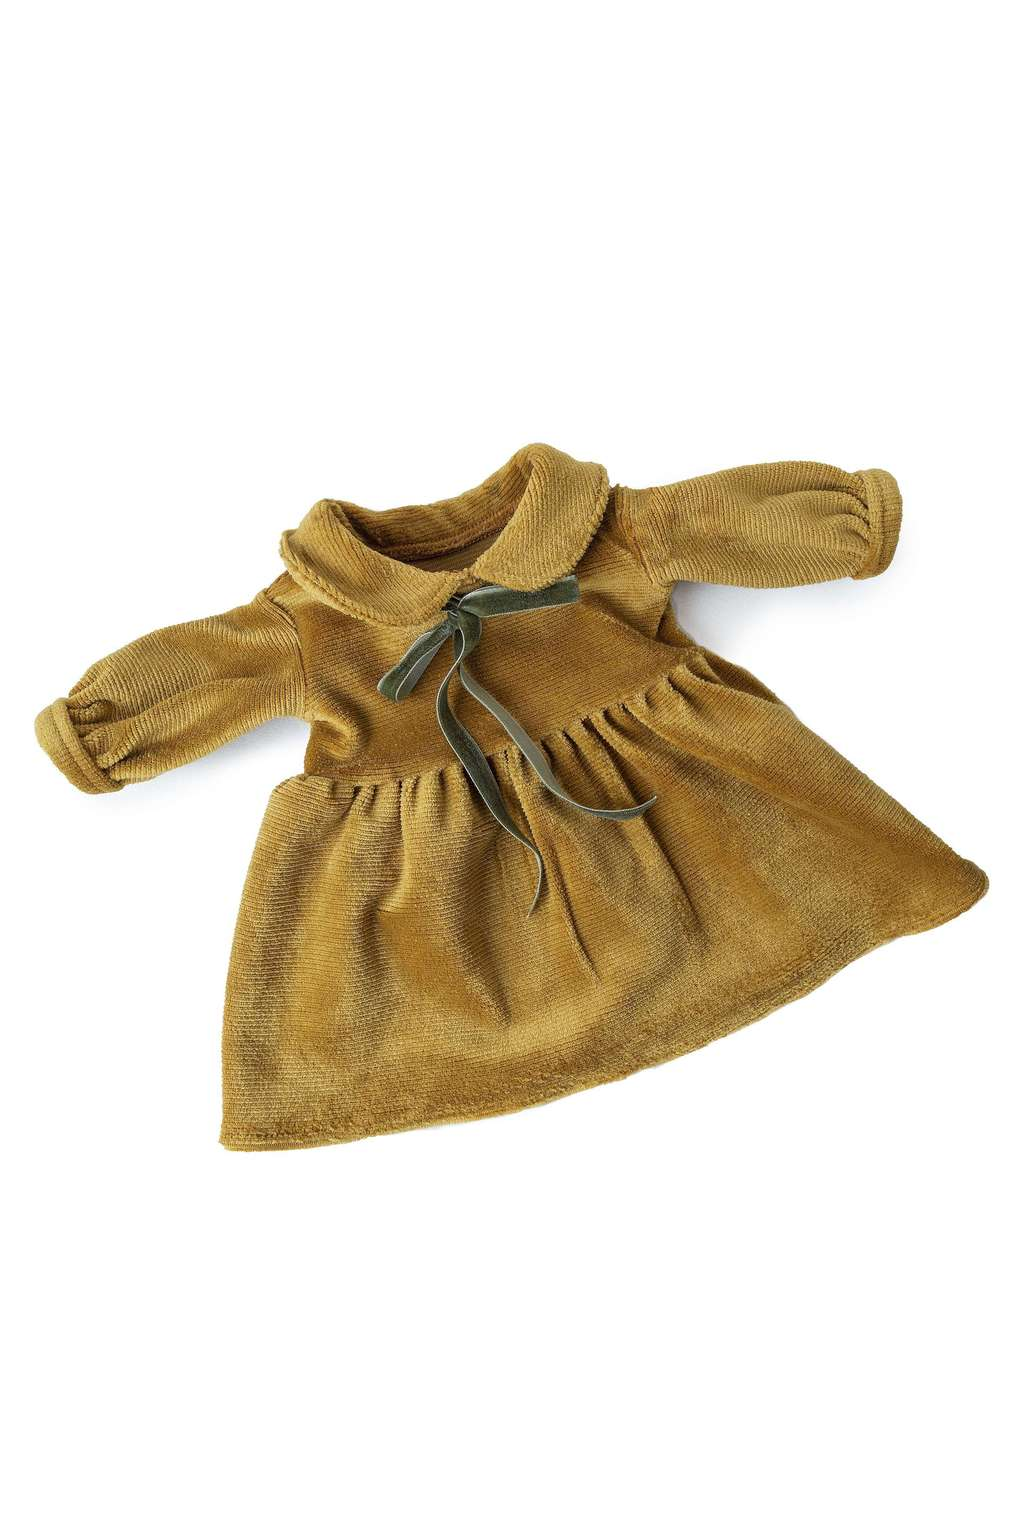 Philomena Kloss kjole - Retro gul -